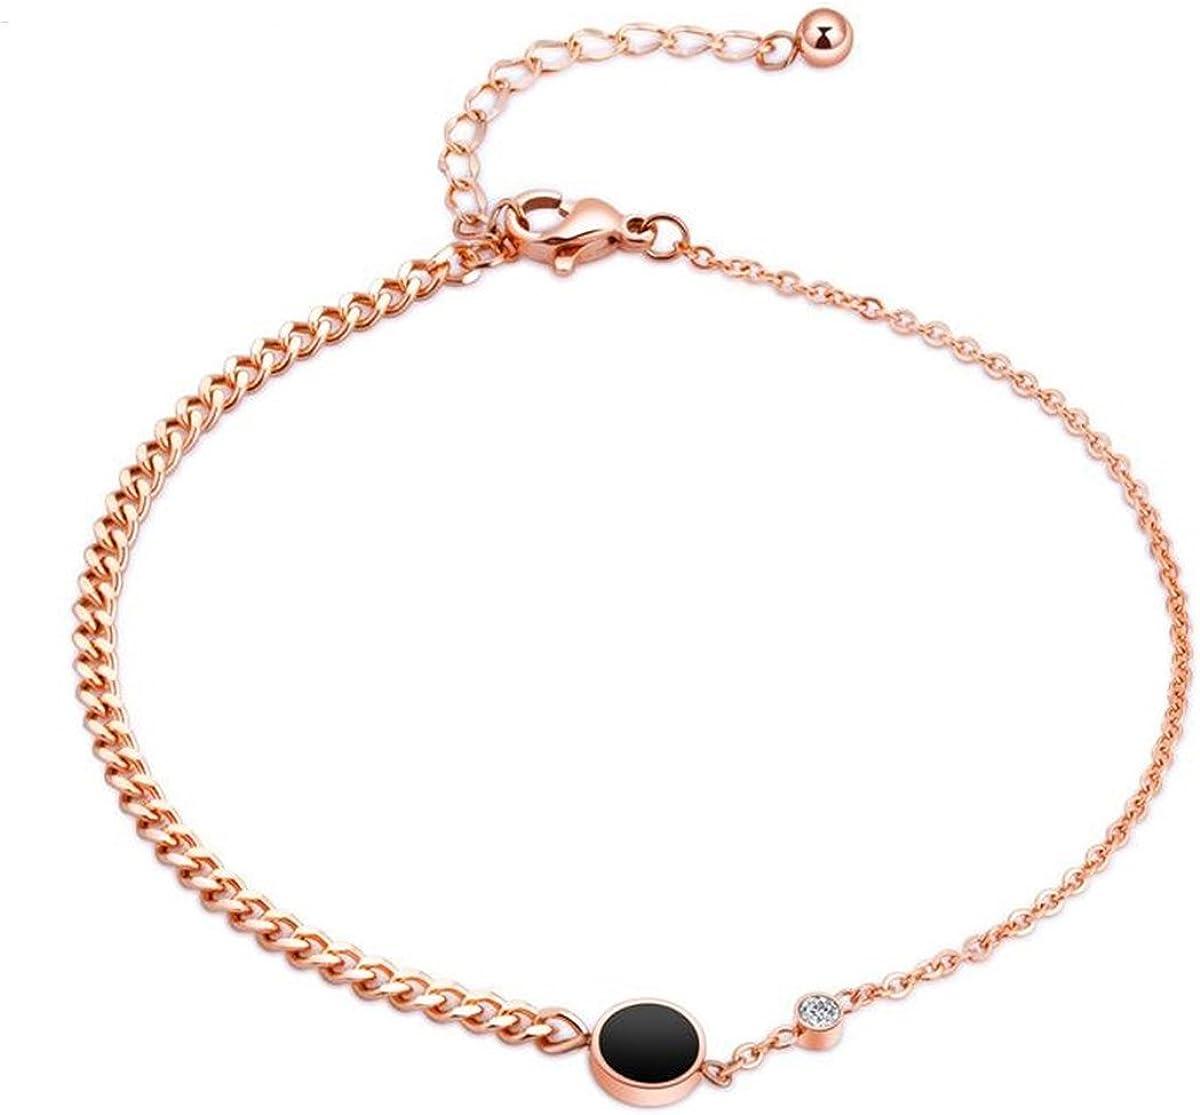 Girls Women Silver//Gold Chain Ankle Bracelet Anklet Foot Jewelry Beach Schöne